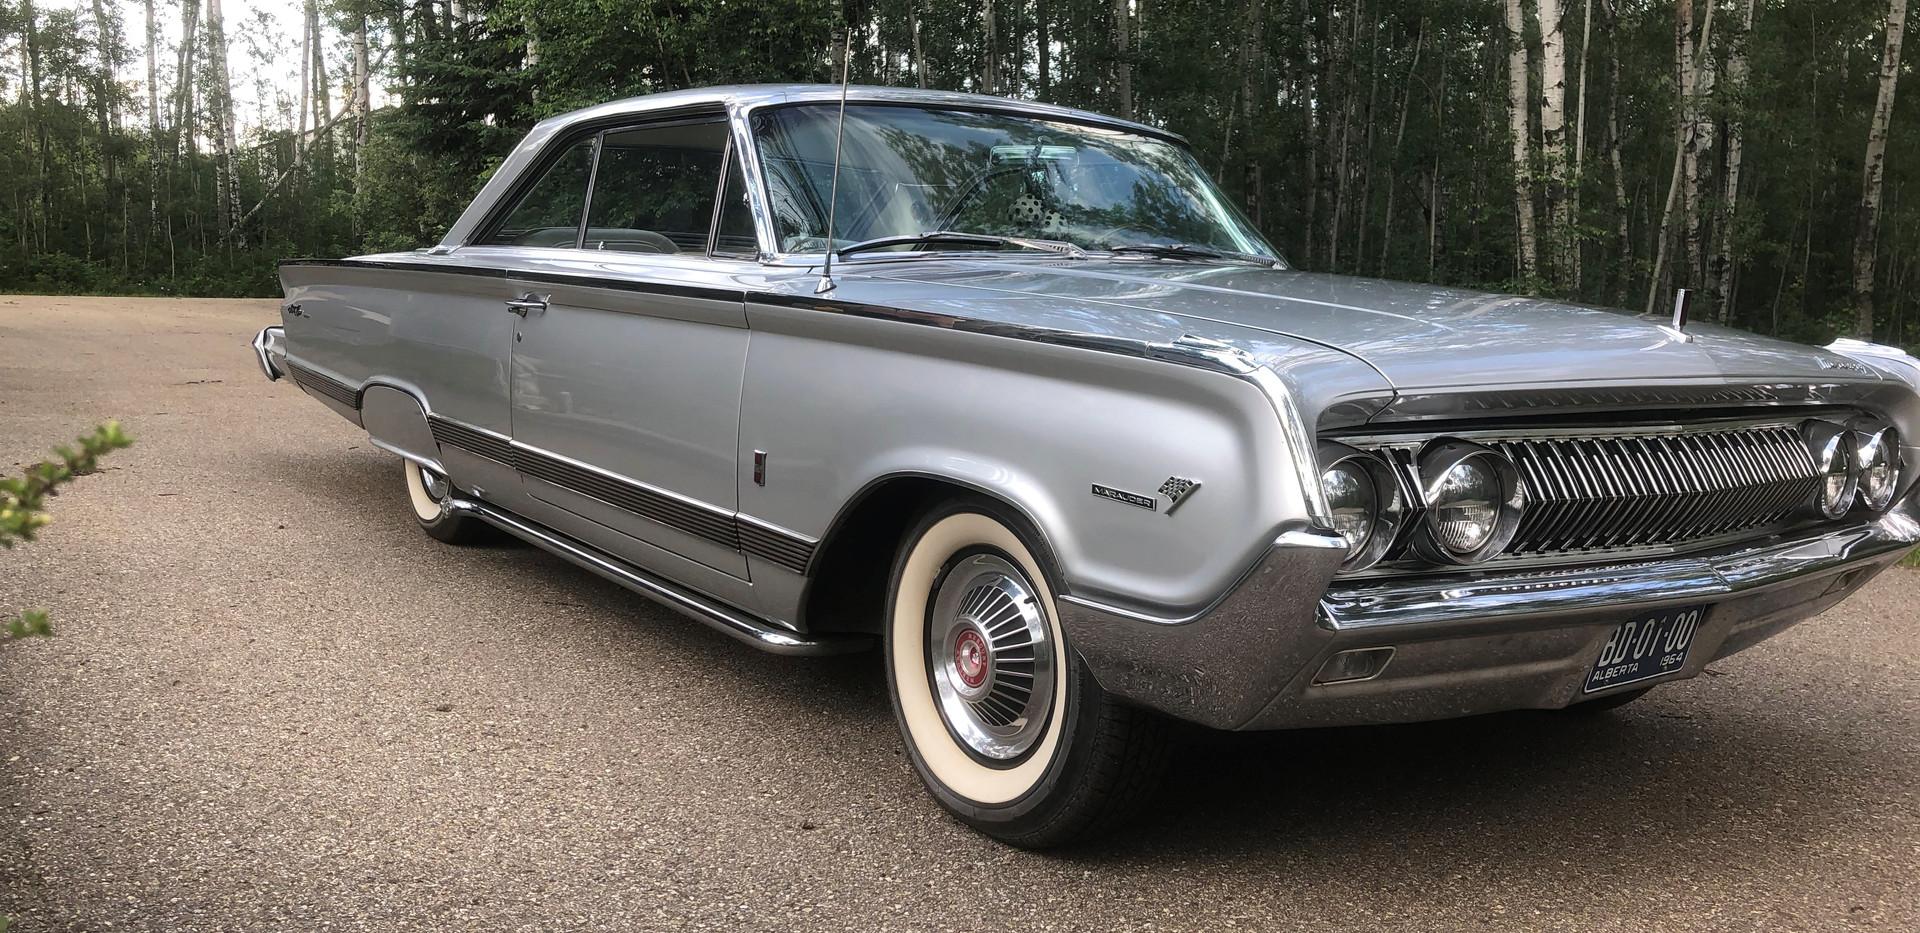 1964 Mercury Parklain Maurader